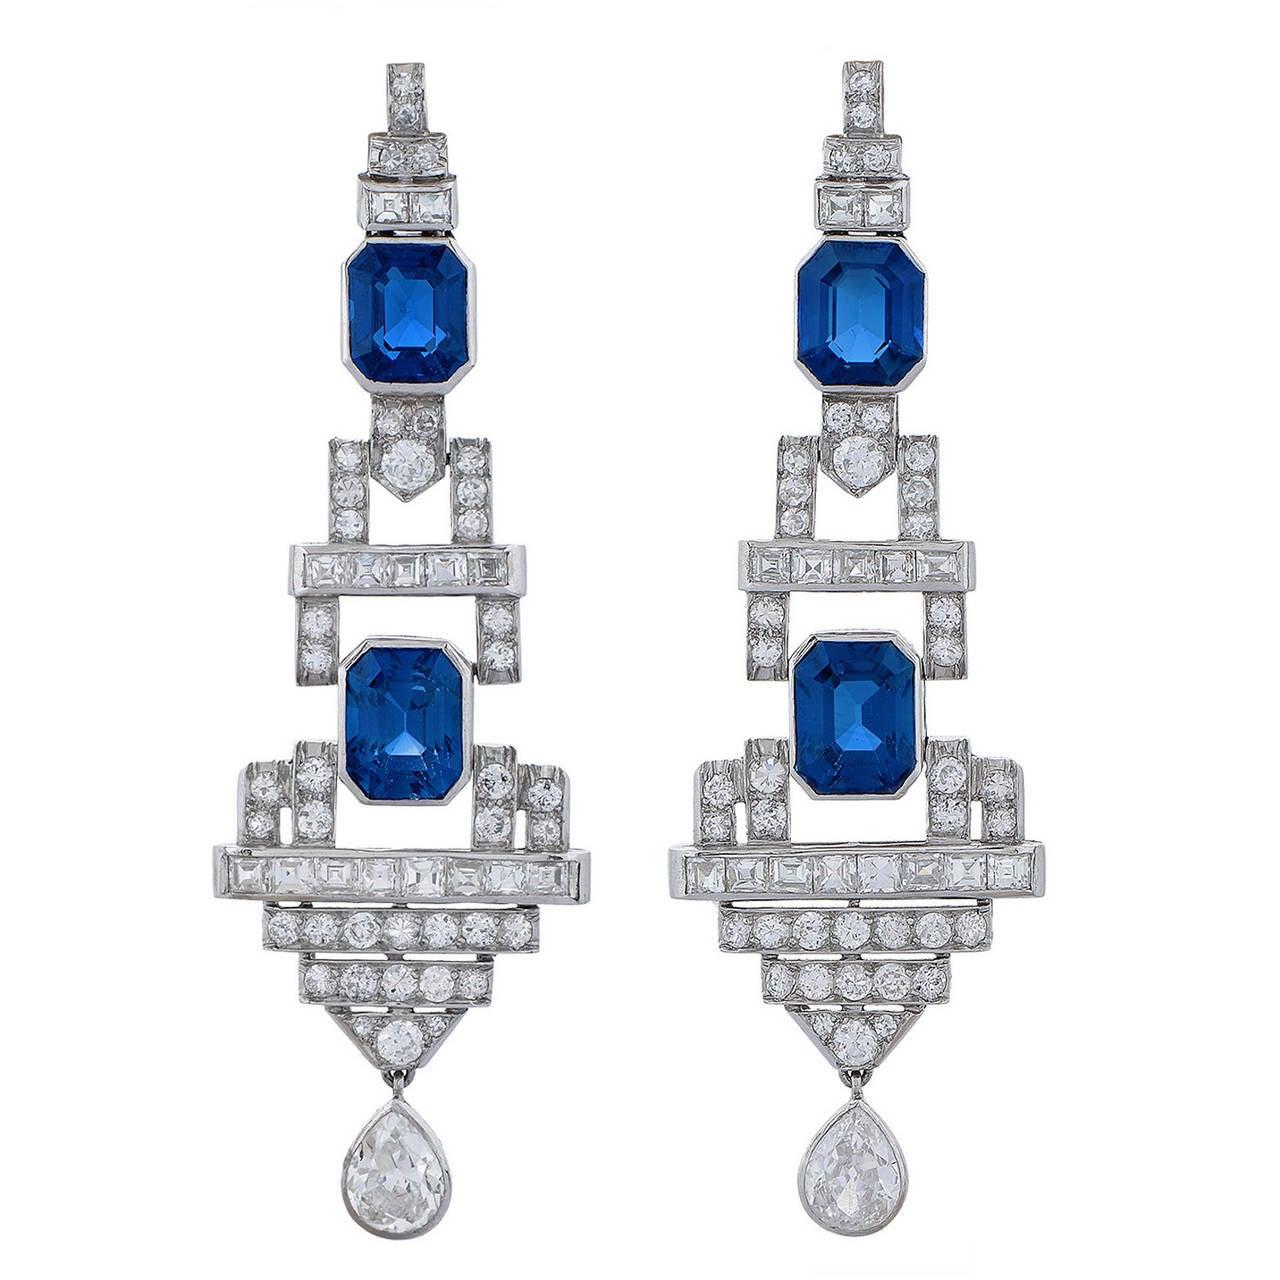 Pair of Art Deco Sapphire and Diamond Ear Pendants